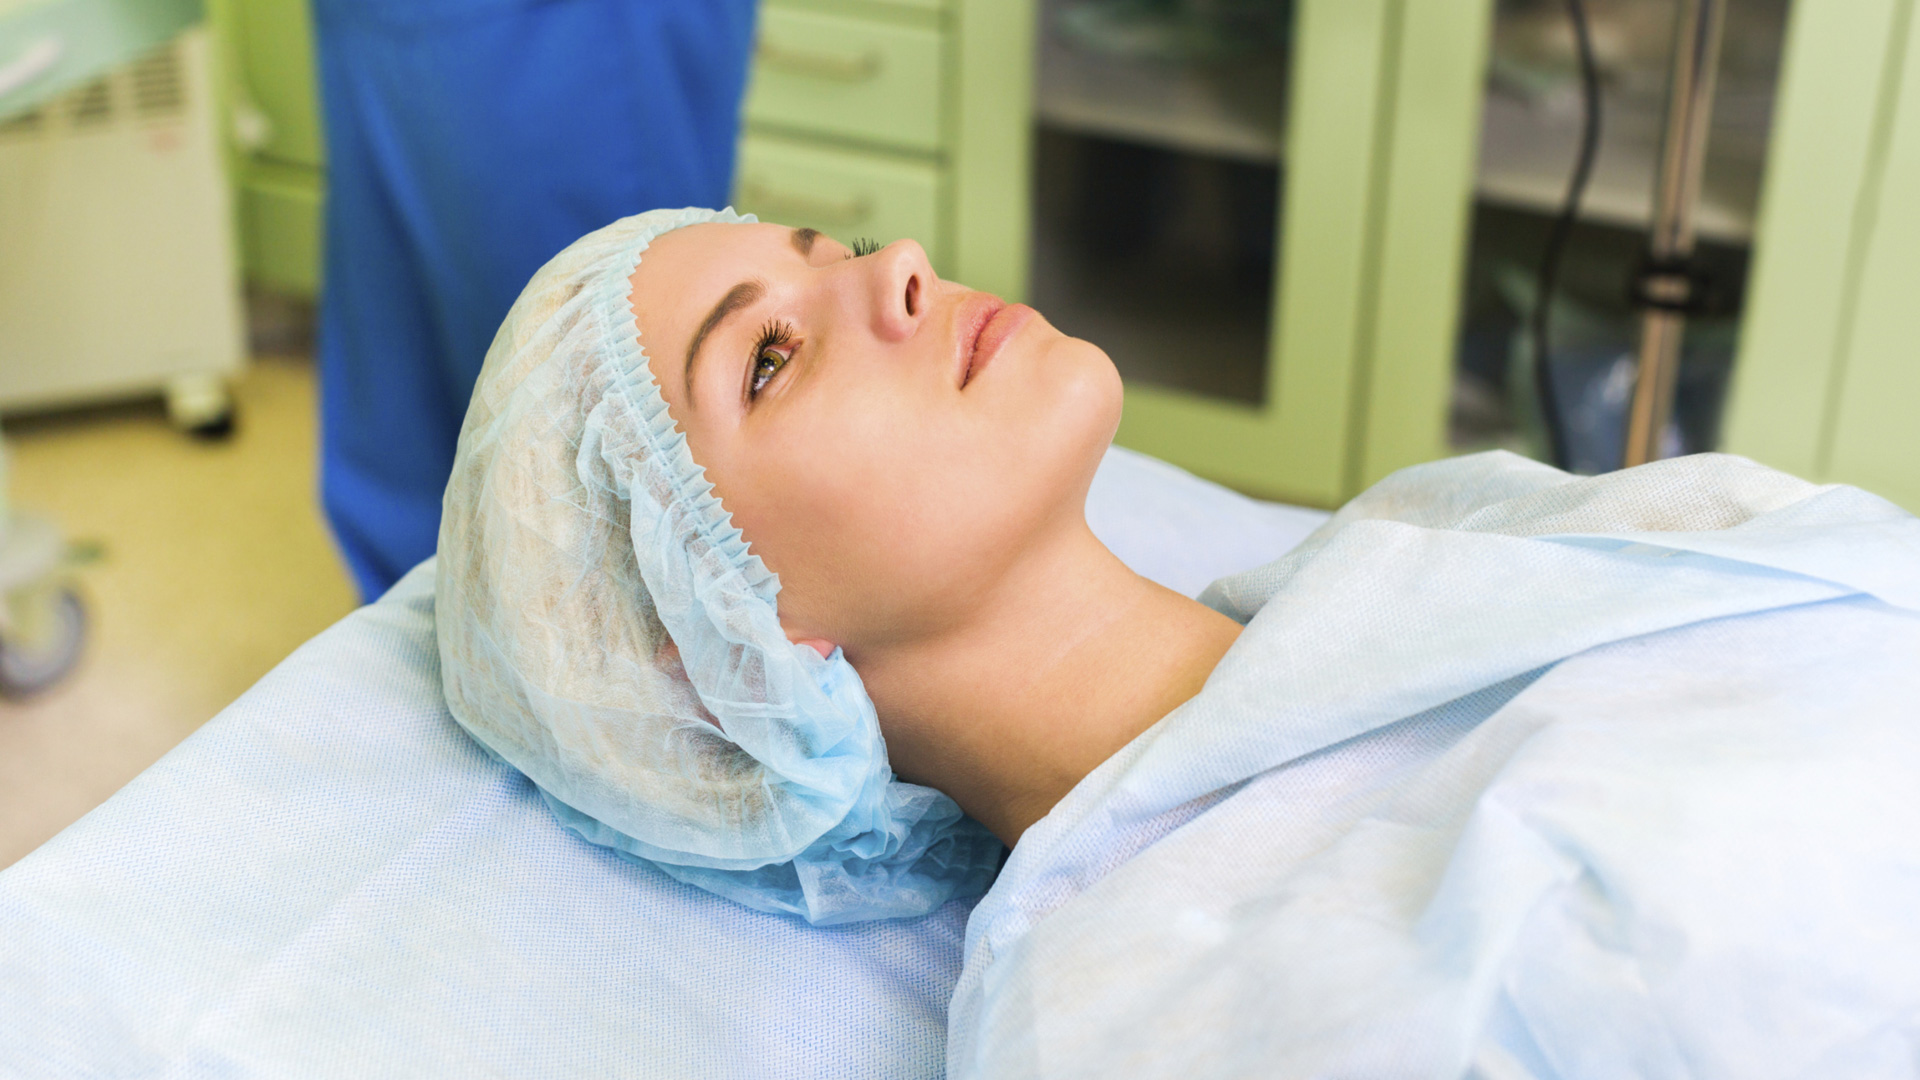 Woman undergoing operation